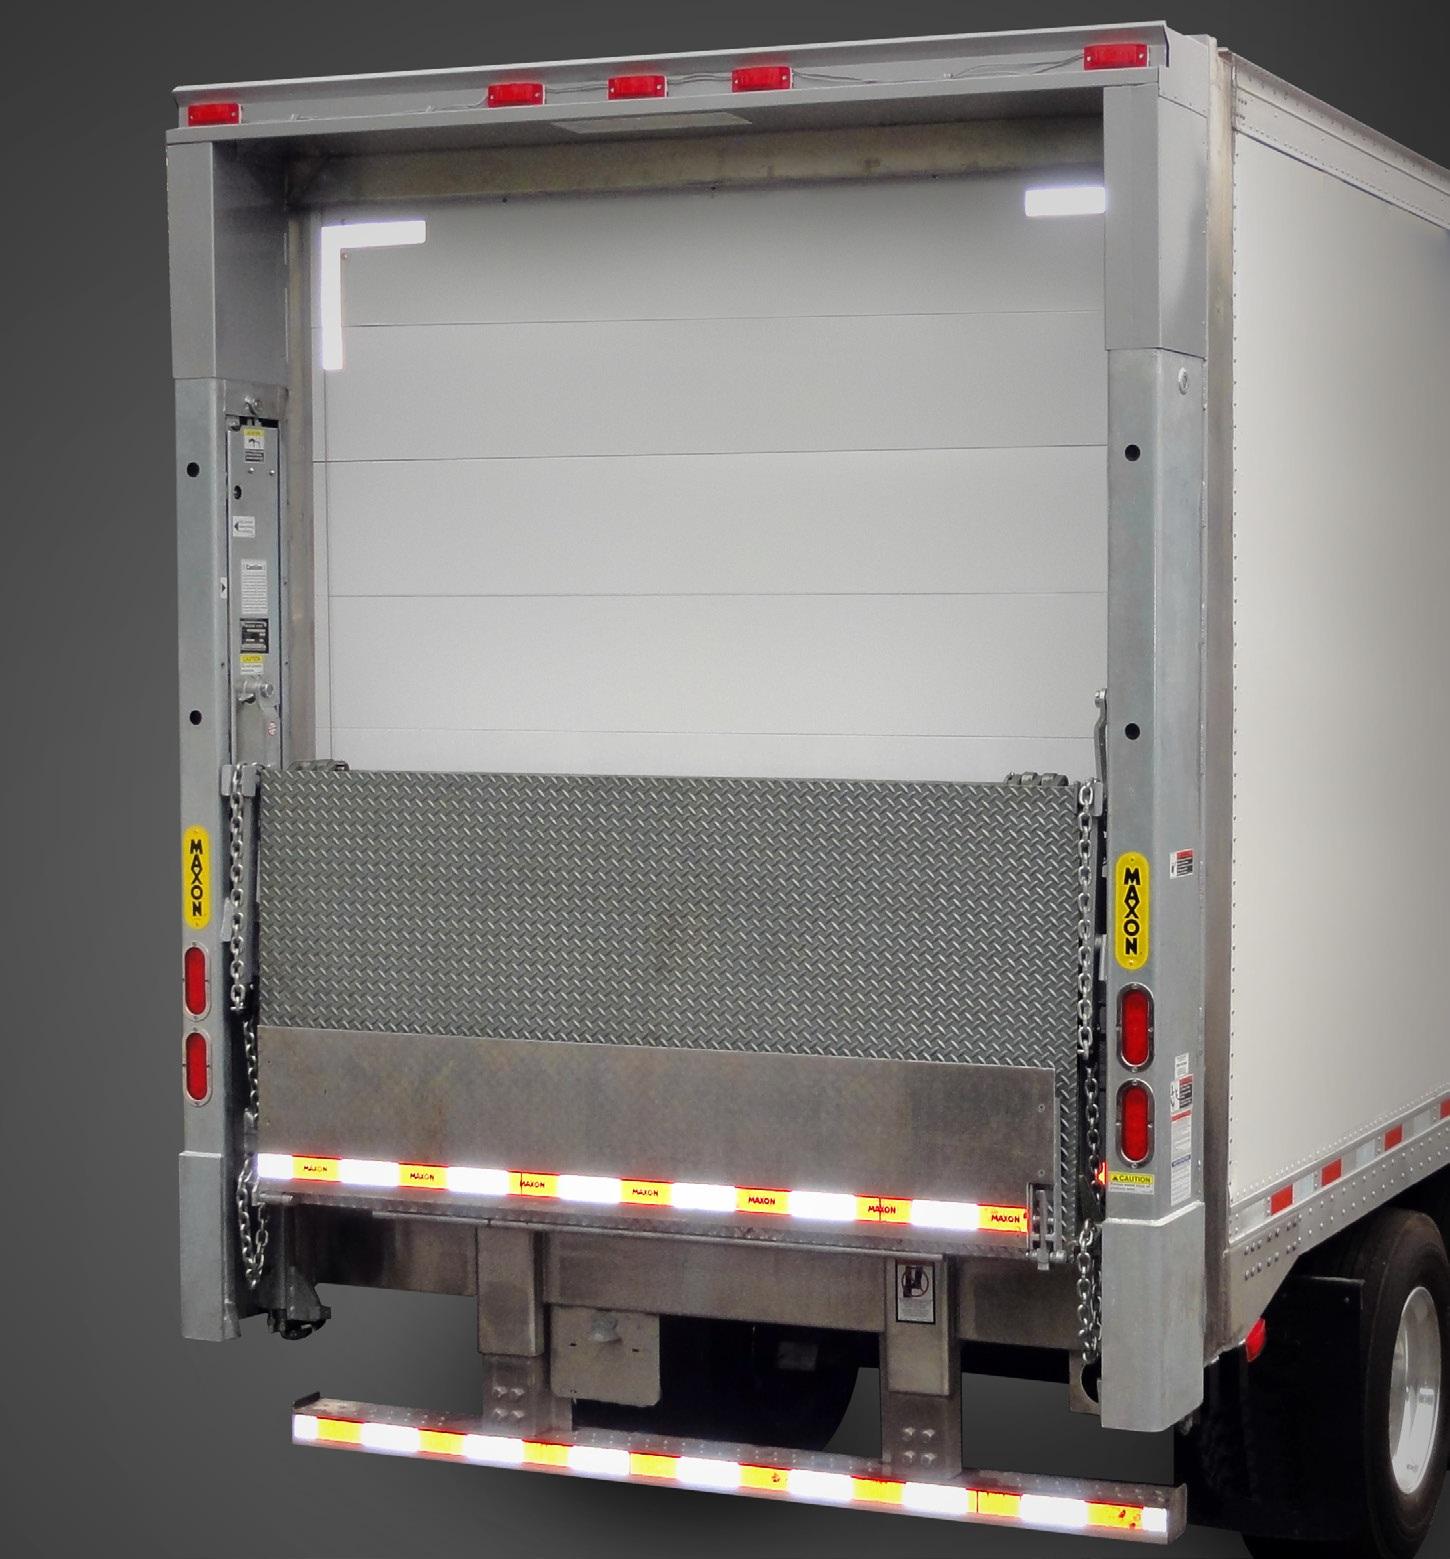 Industrial Lift Gate : Commercial truck success maxon galvanized liftgates